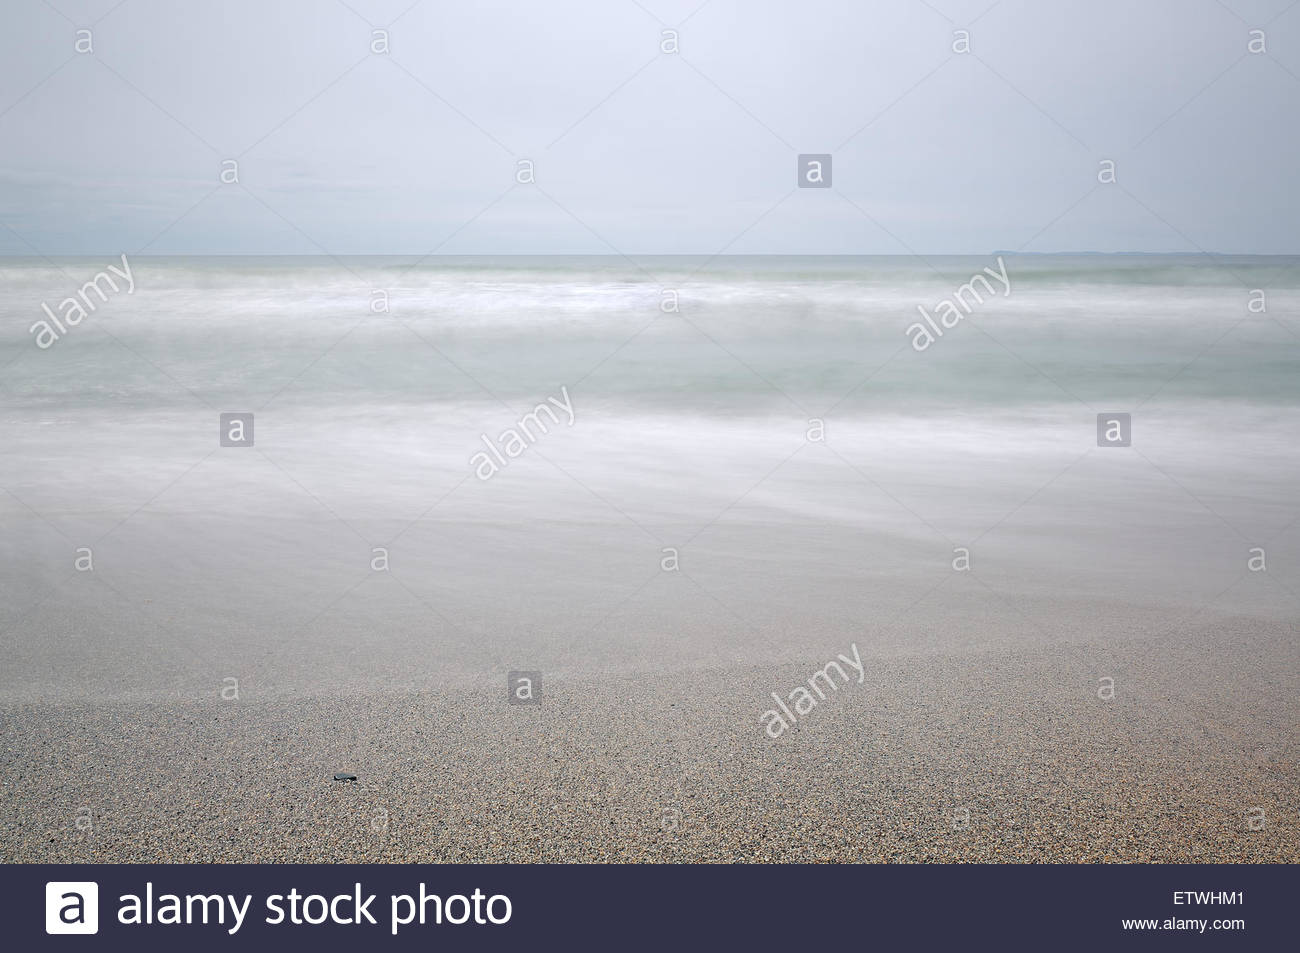 A minimalist photograph of Dunaverty beach on the south coast of Kintyre, Scotland. - Stock Image